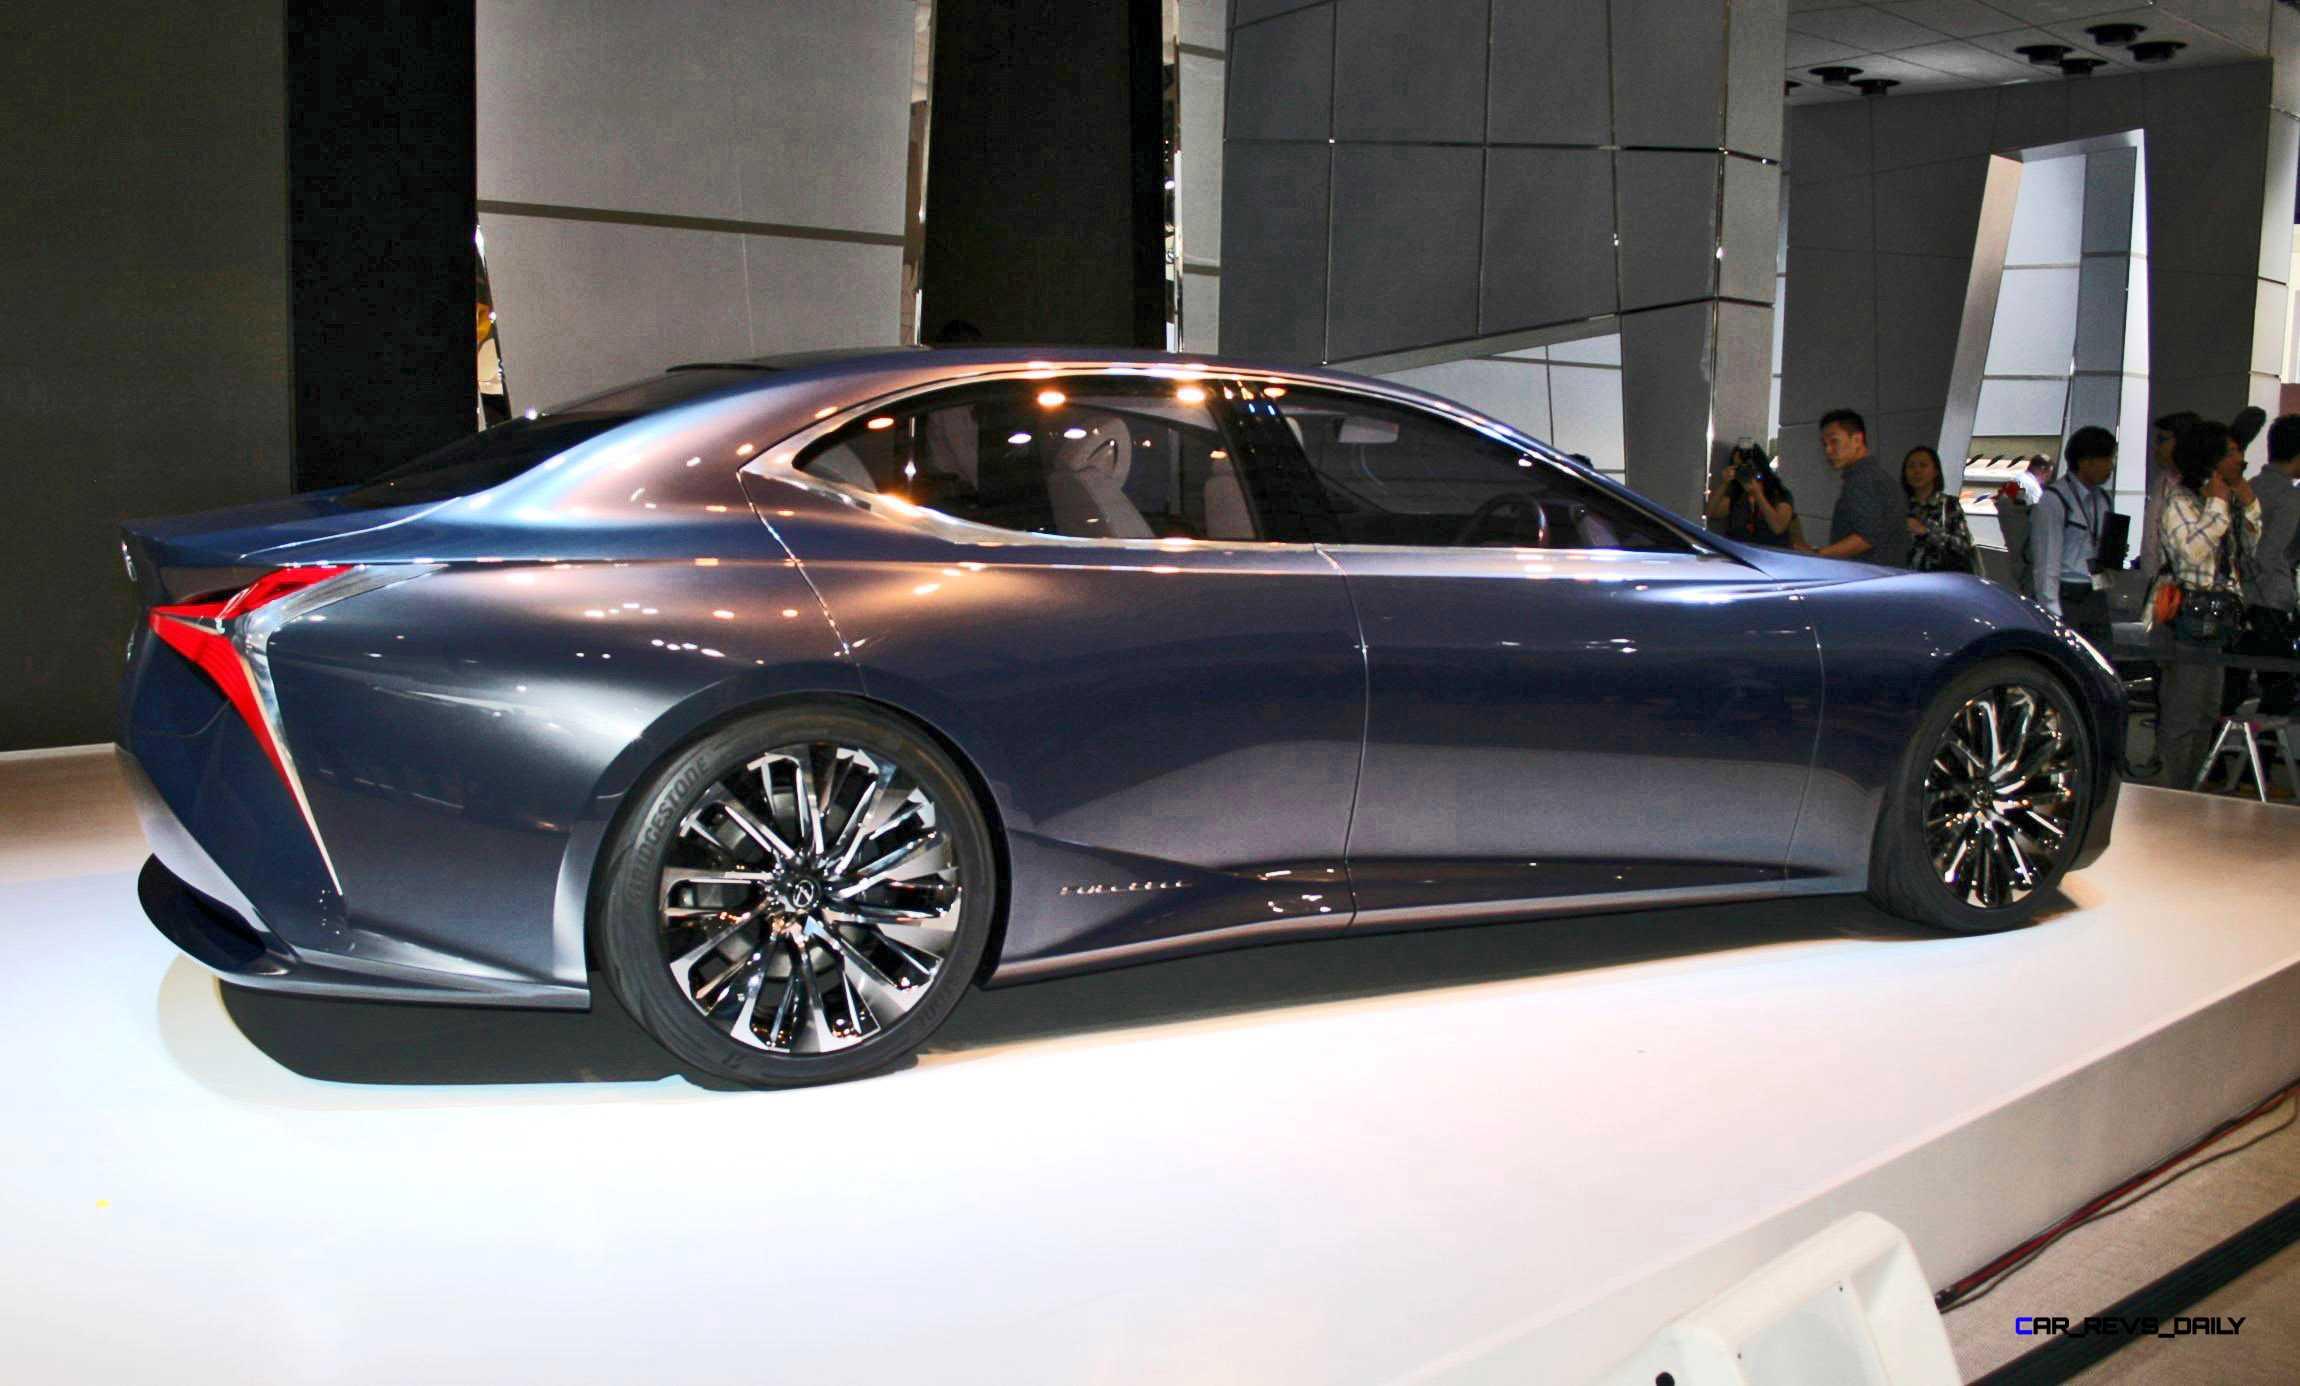 http://www.car-revs-daily.com/wp-content/uploads/2015/10/2015-Lexus-LF-FC-Flagship-Concept-71.jpg